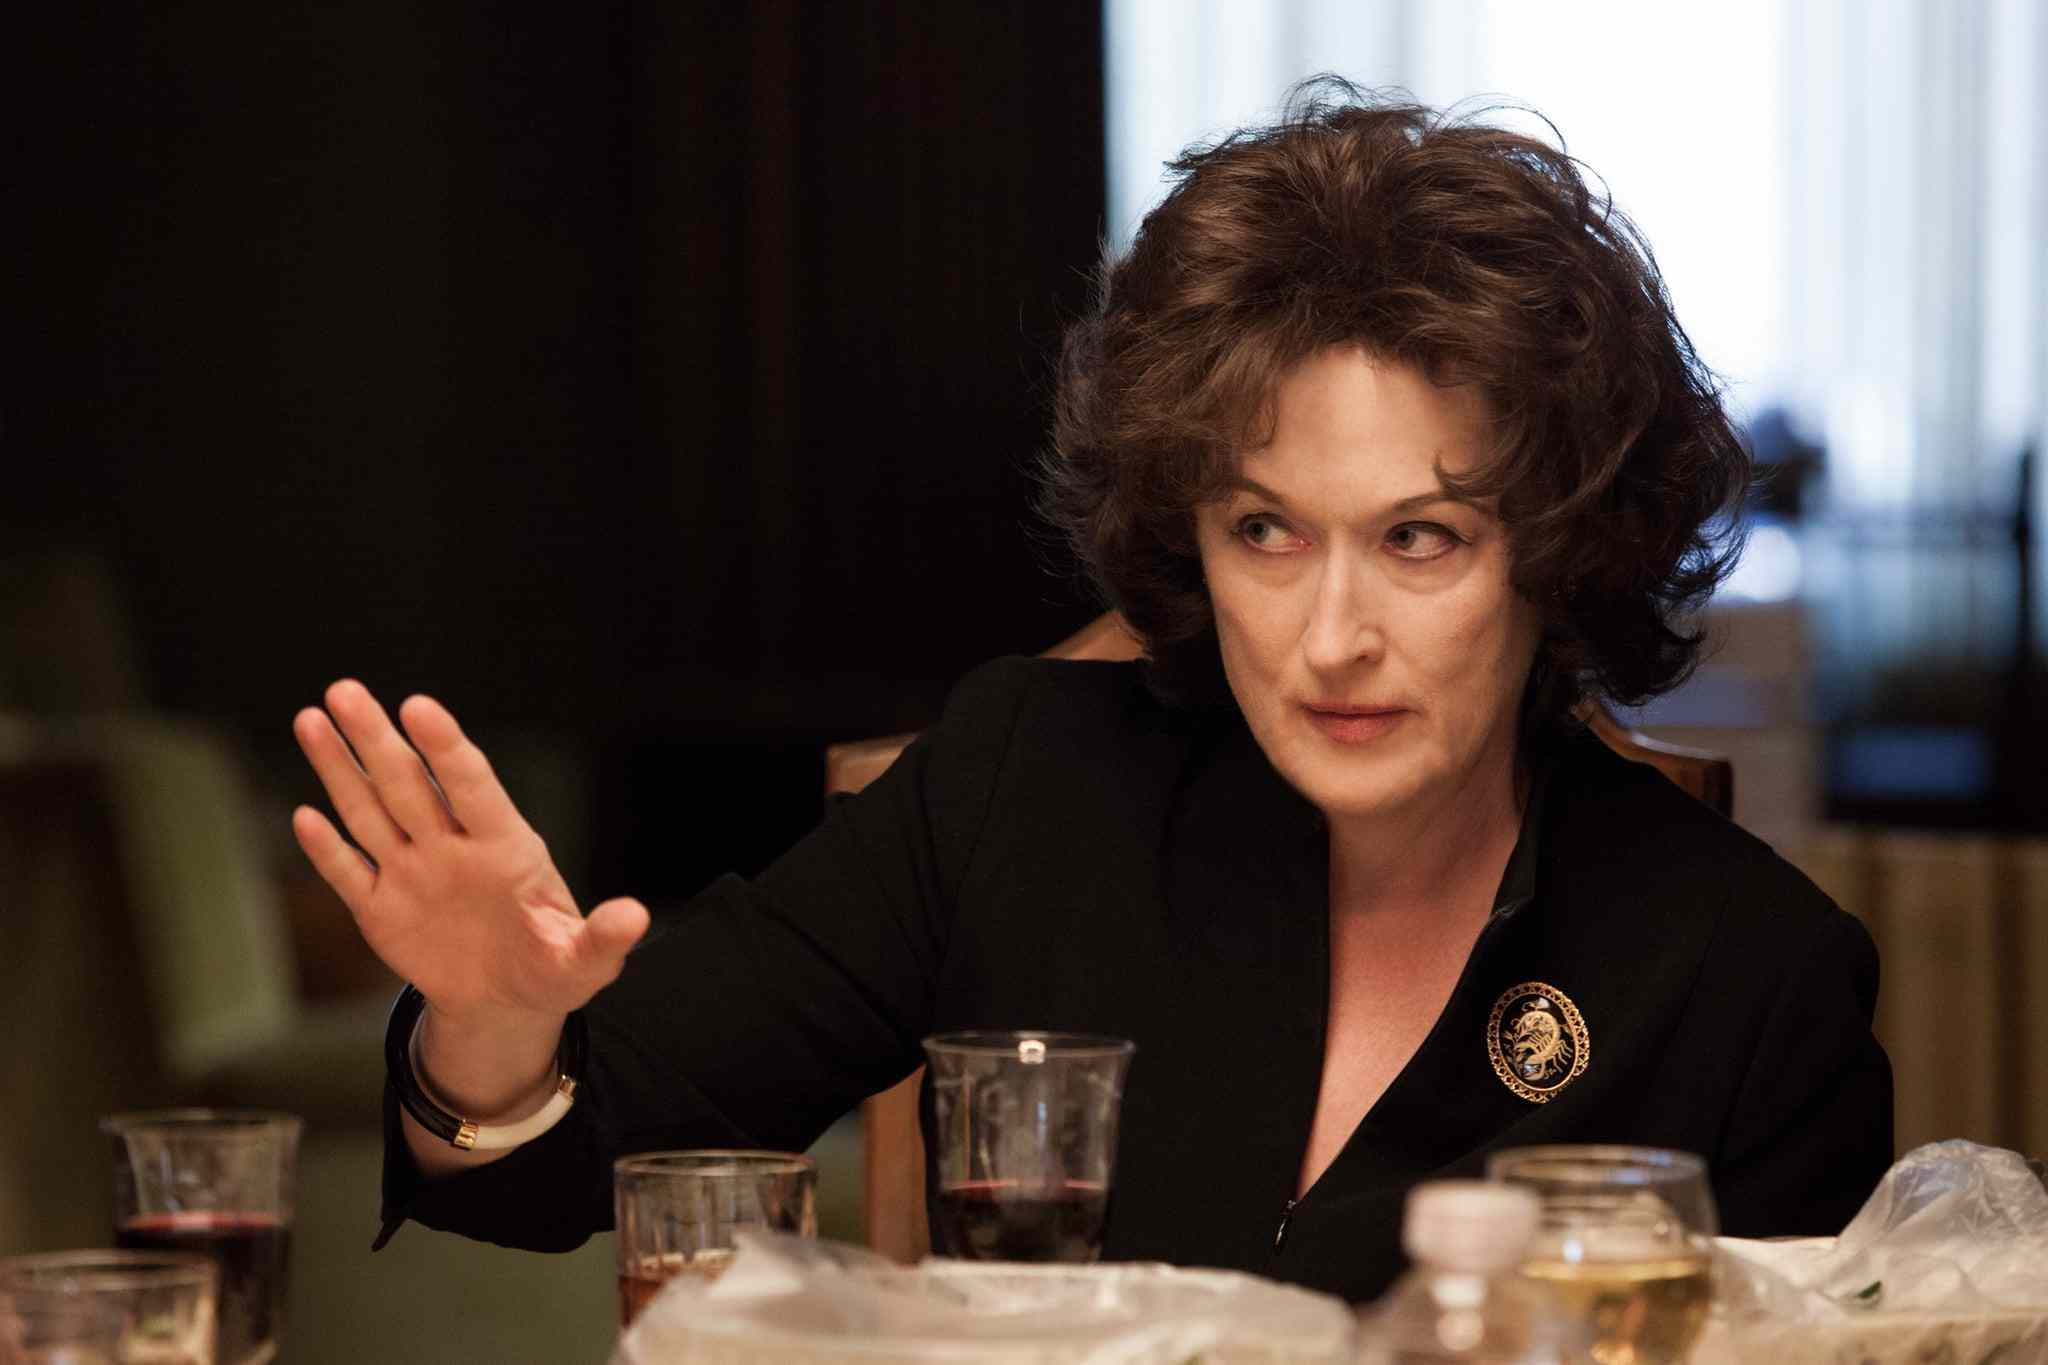 Meryl-Streep-August-Osage-County filme bune pe netflix